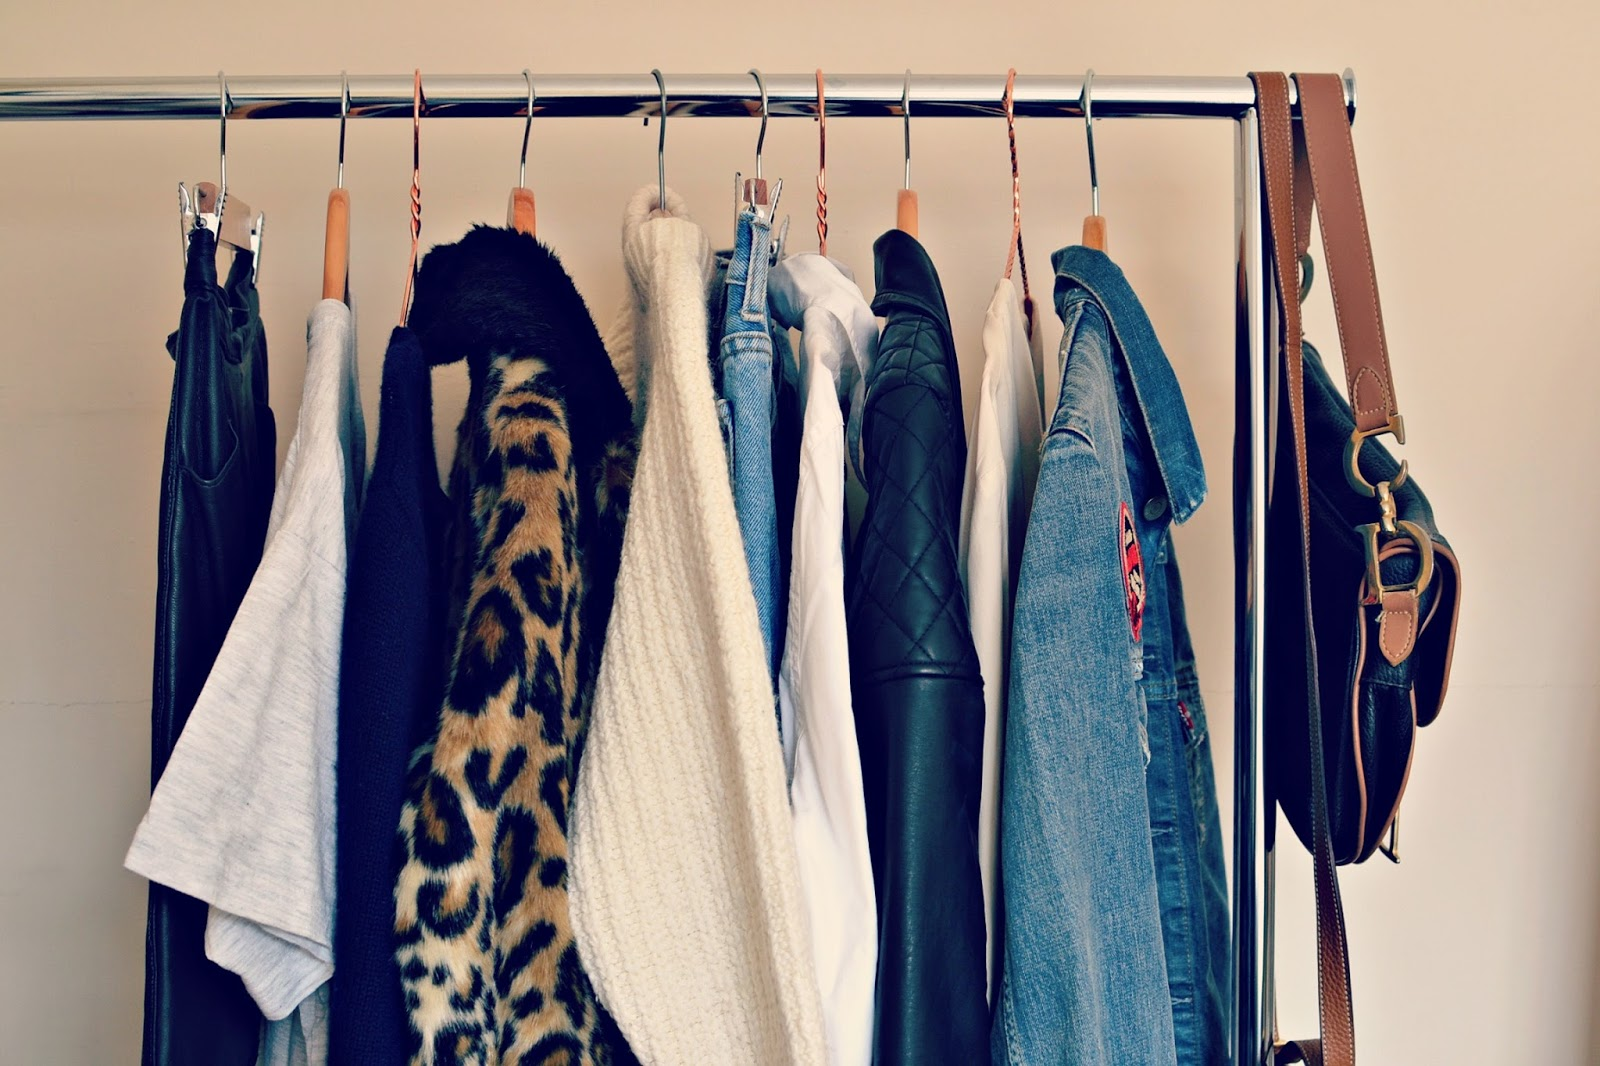 capsule wardrobe, capsule, vintage, wardrobe